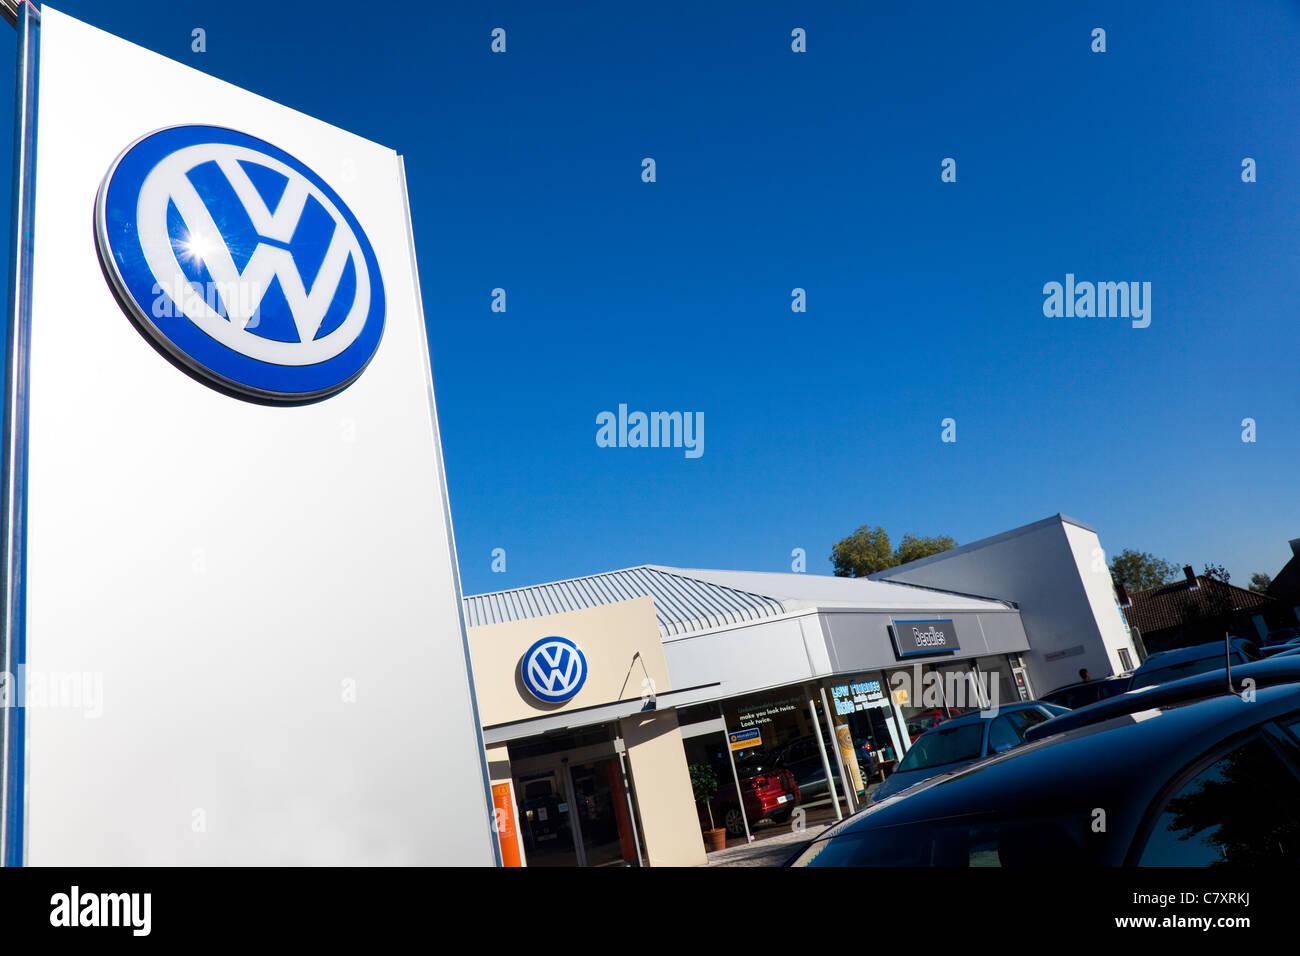 Sign, Volkswagen main dealer, London, UK - Stock Image